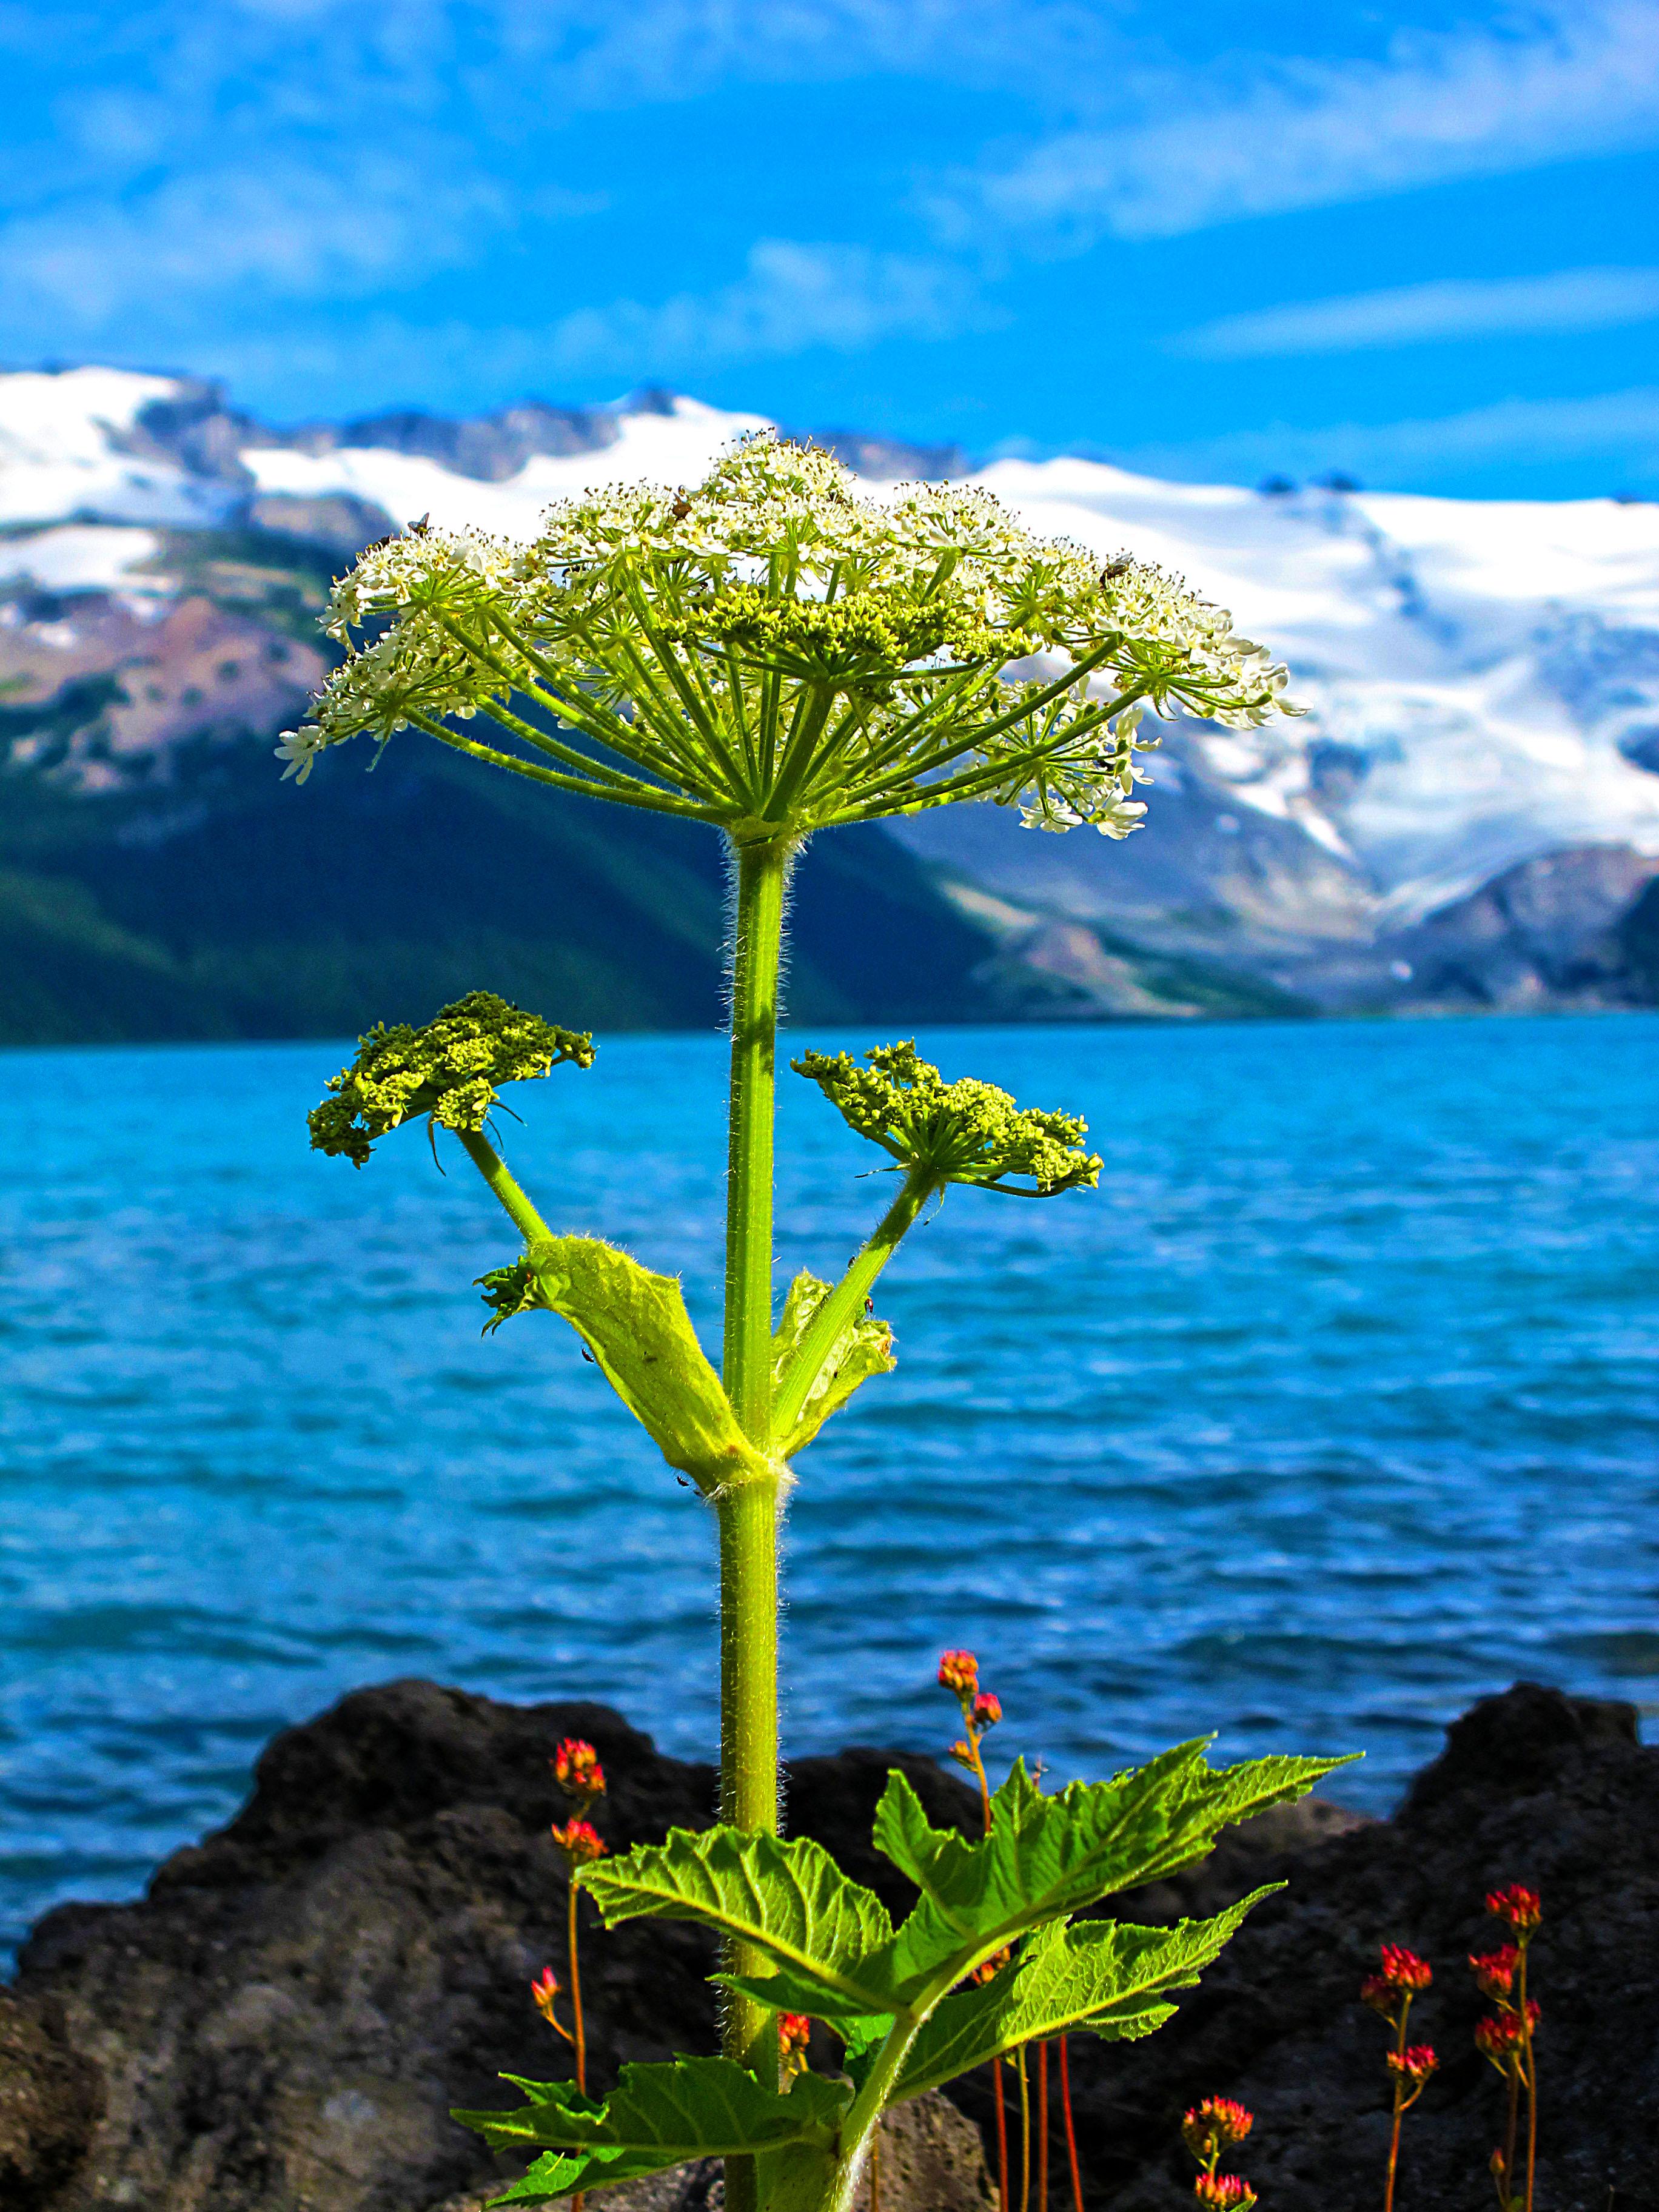 Colourful Nature Hoda Photography